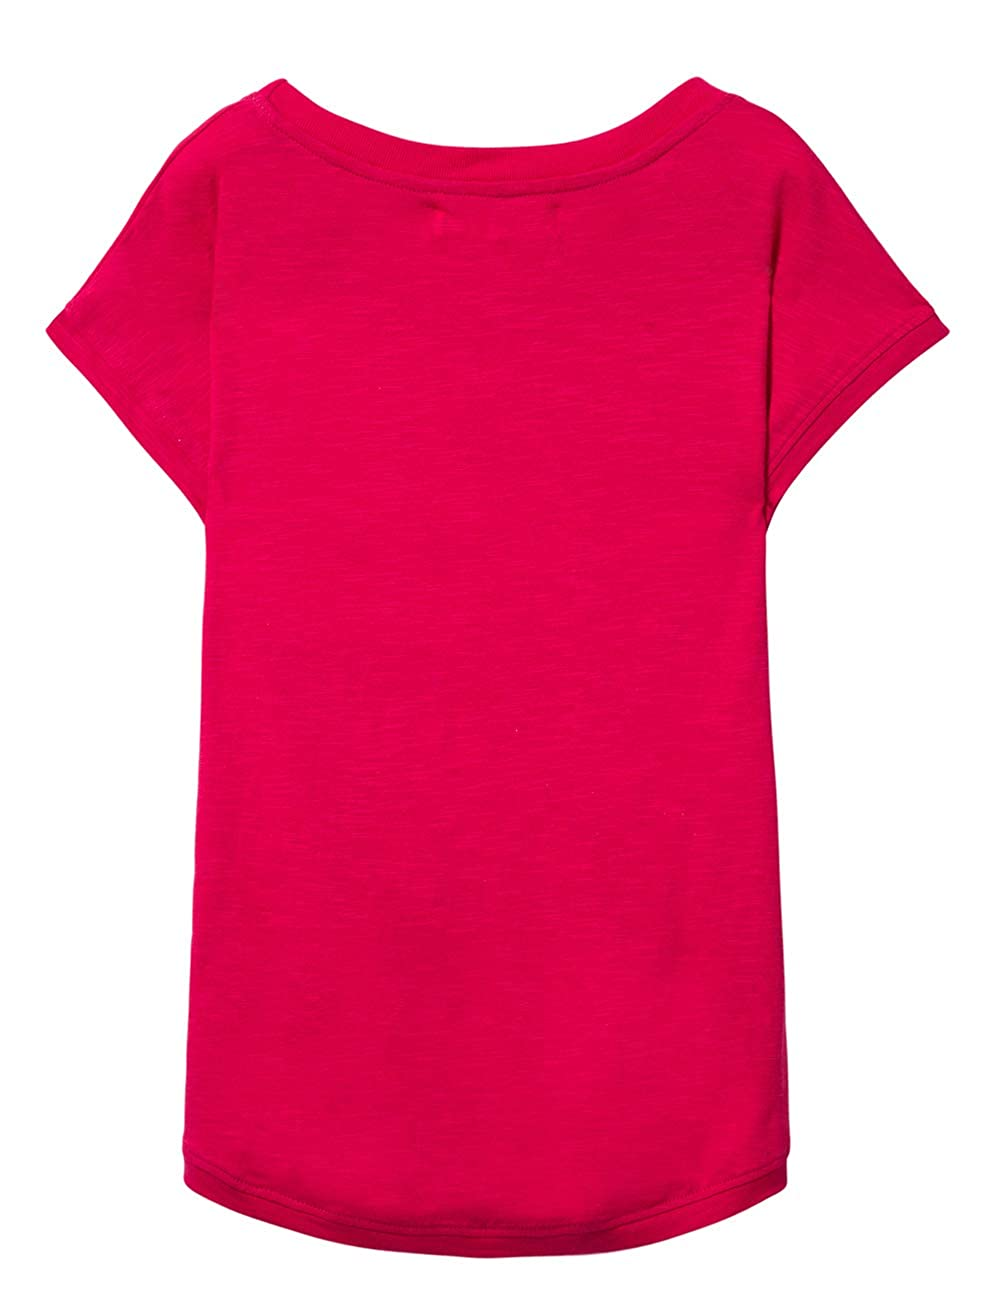 Camiseta para Ni/ñas TS/_calonge Desigual Girl Knit T-Shirt Short Sleeve